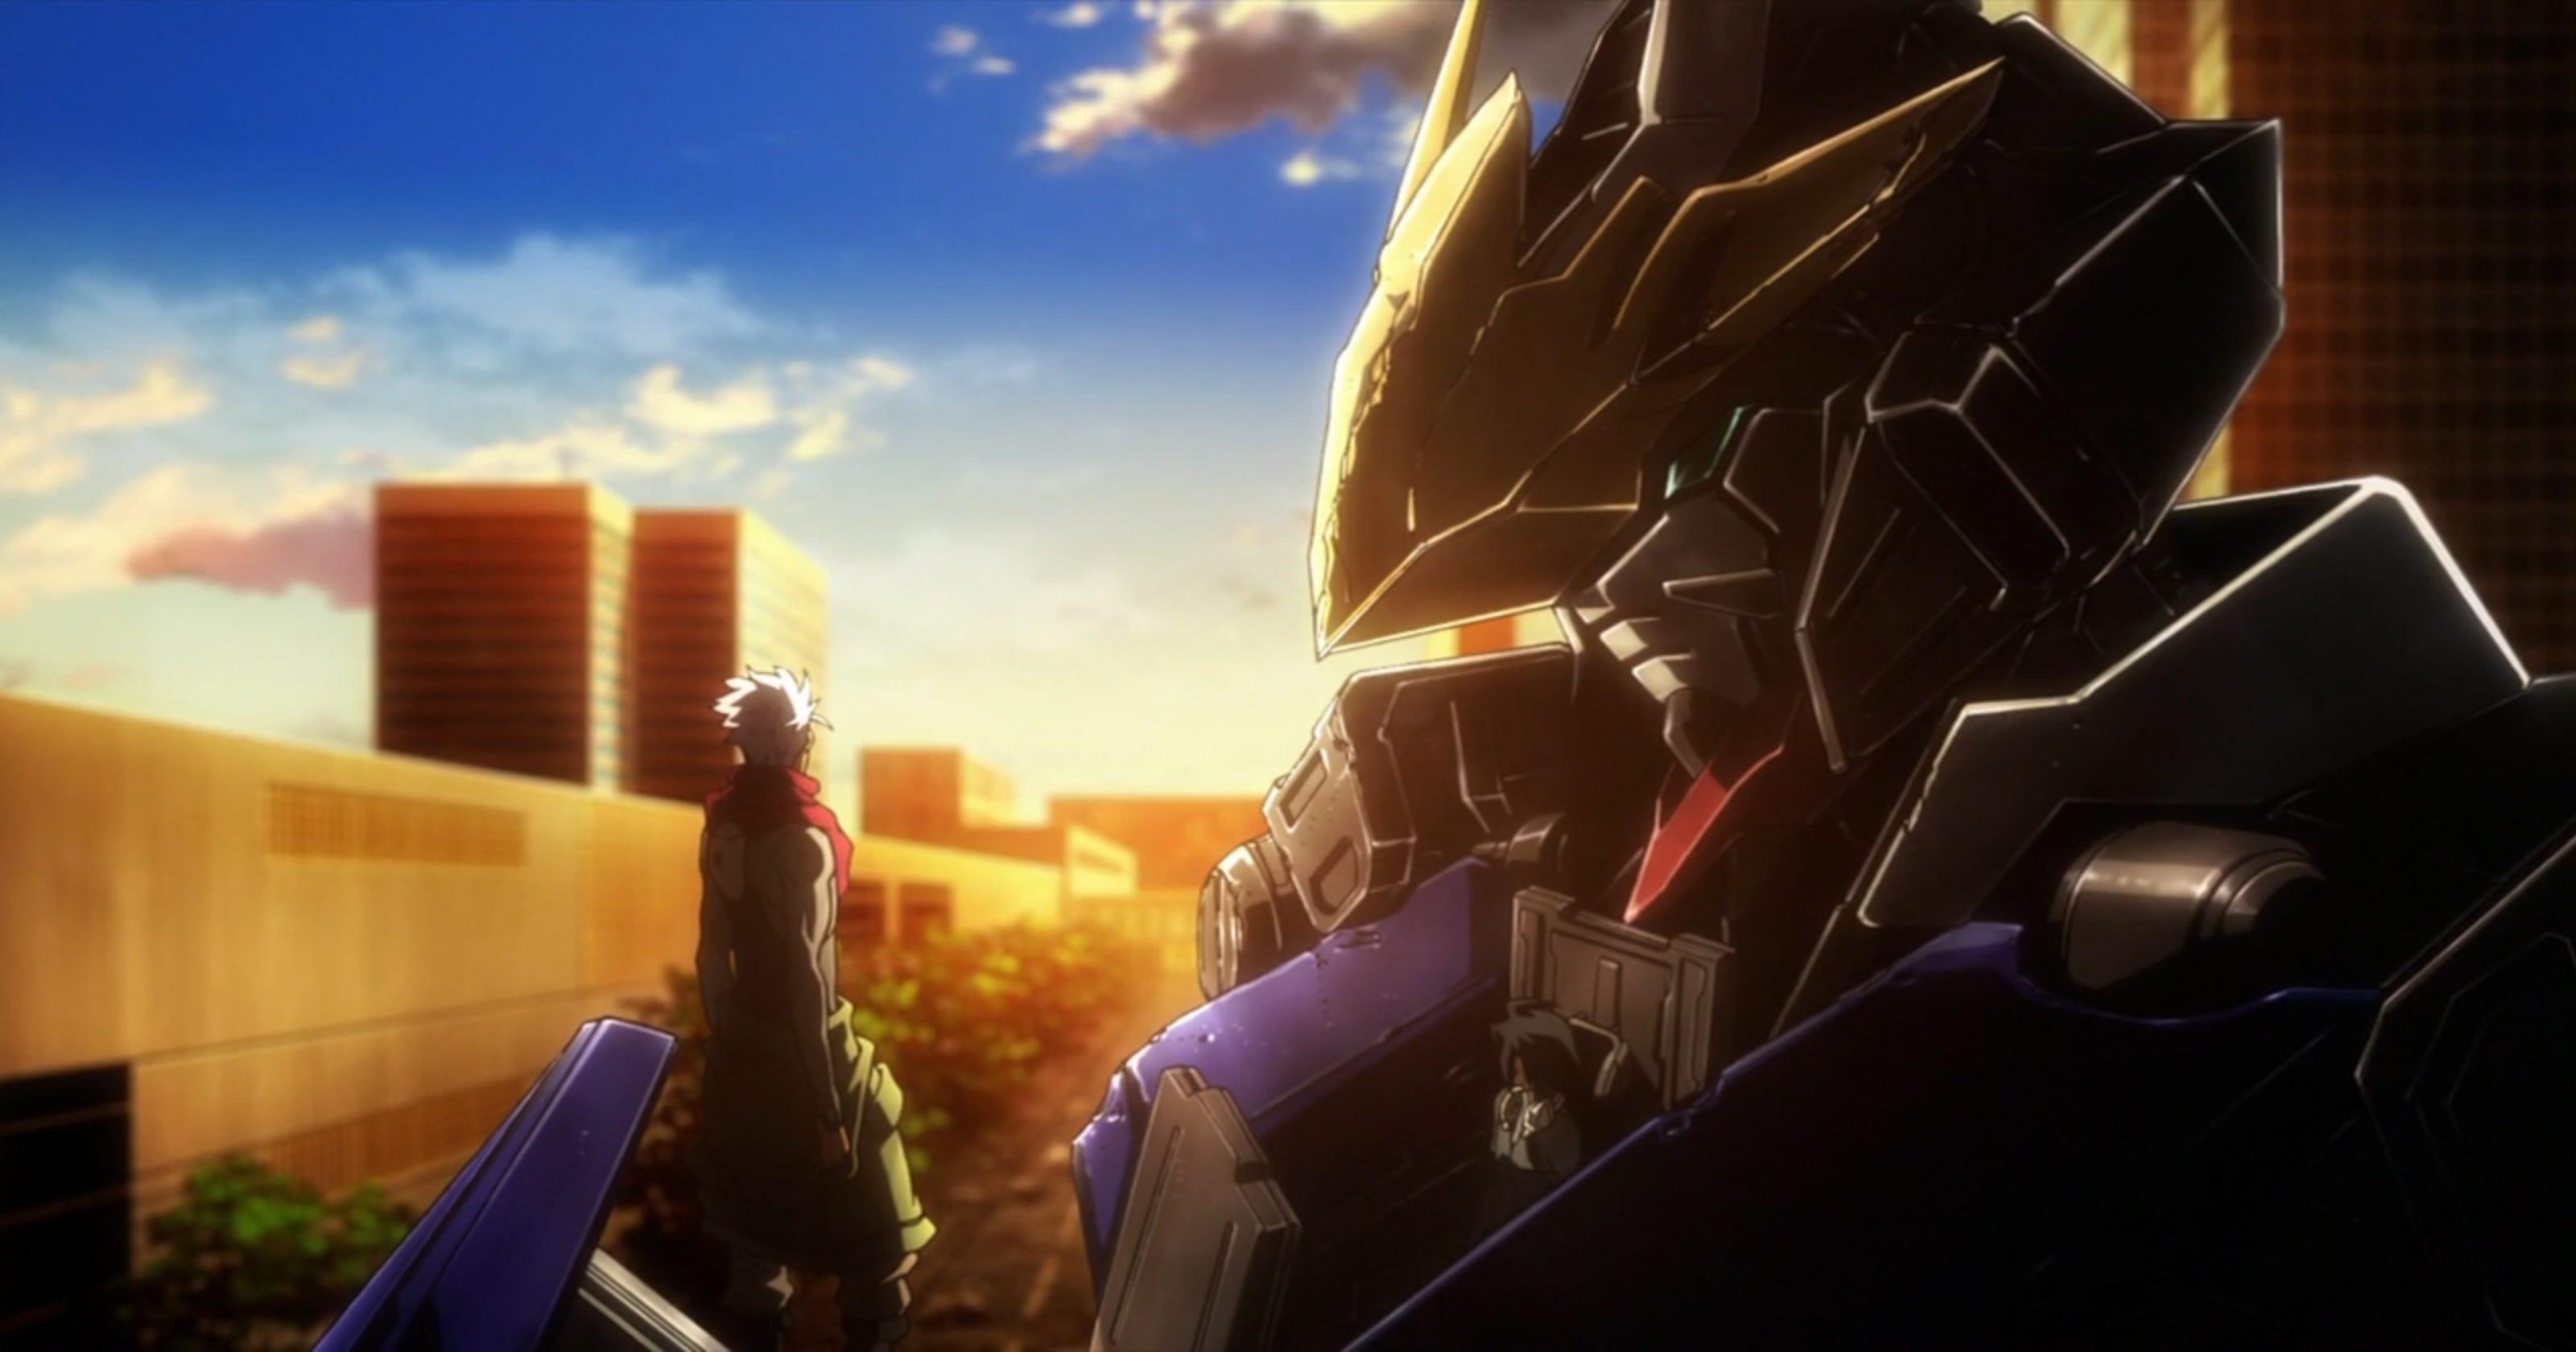 mobile suit gundam iron-blooded orphans 2nd season episode 25